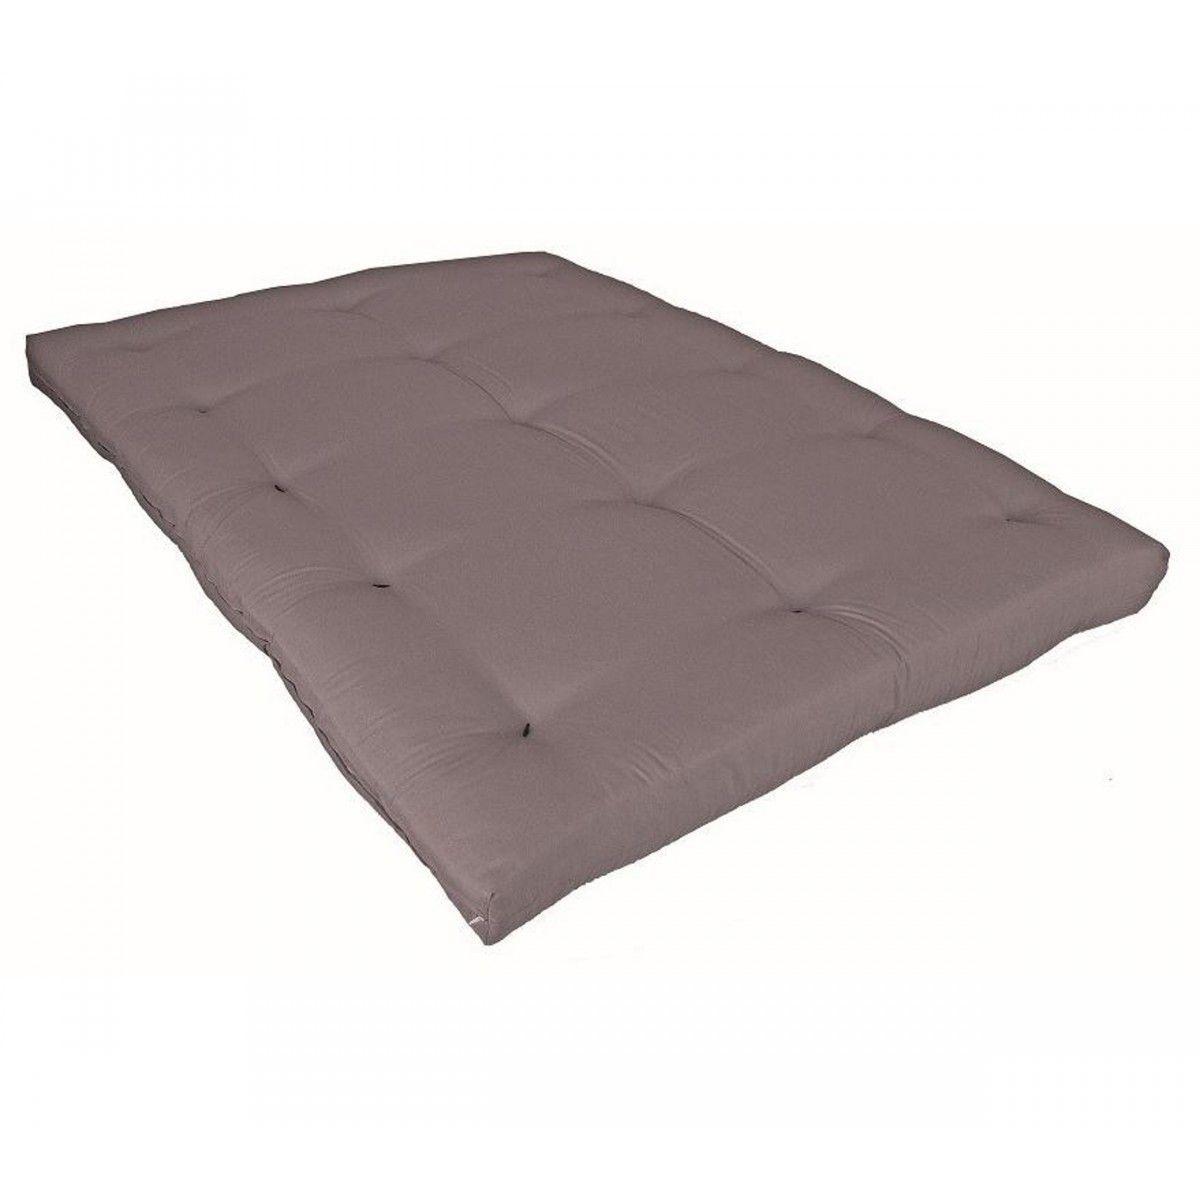 sur matelas 140 190 topiwall. Black Bedroom Furniture Sets. Home Design Ideas